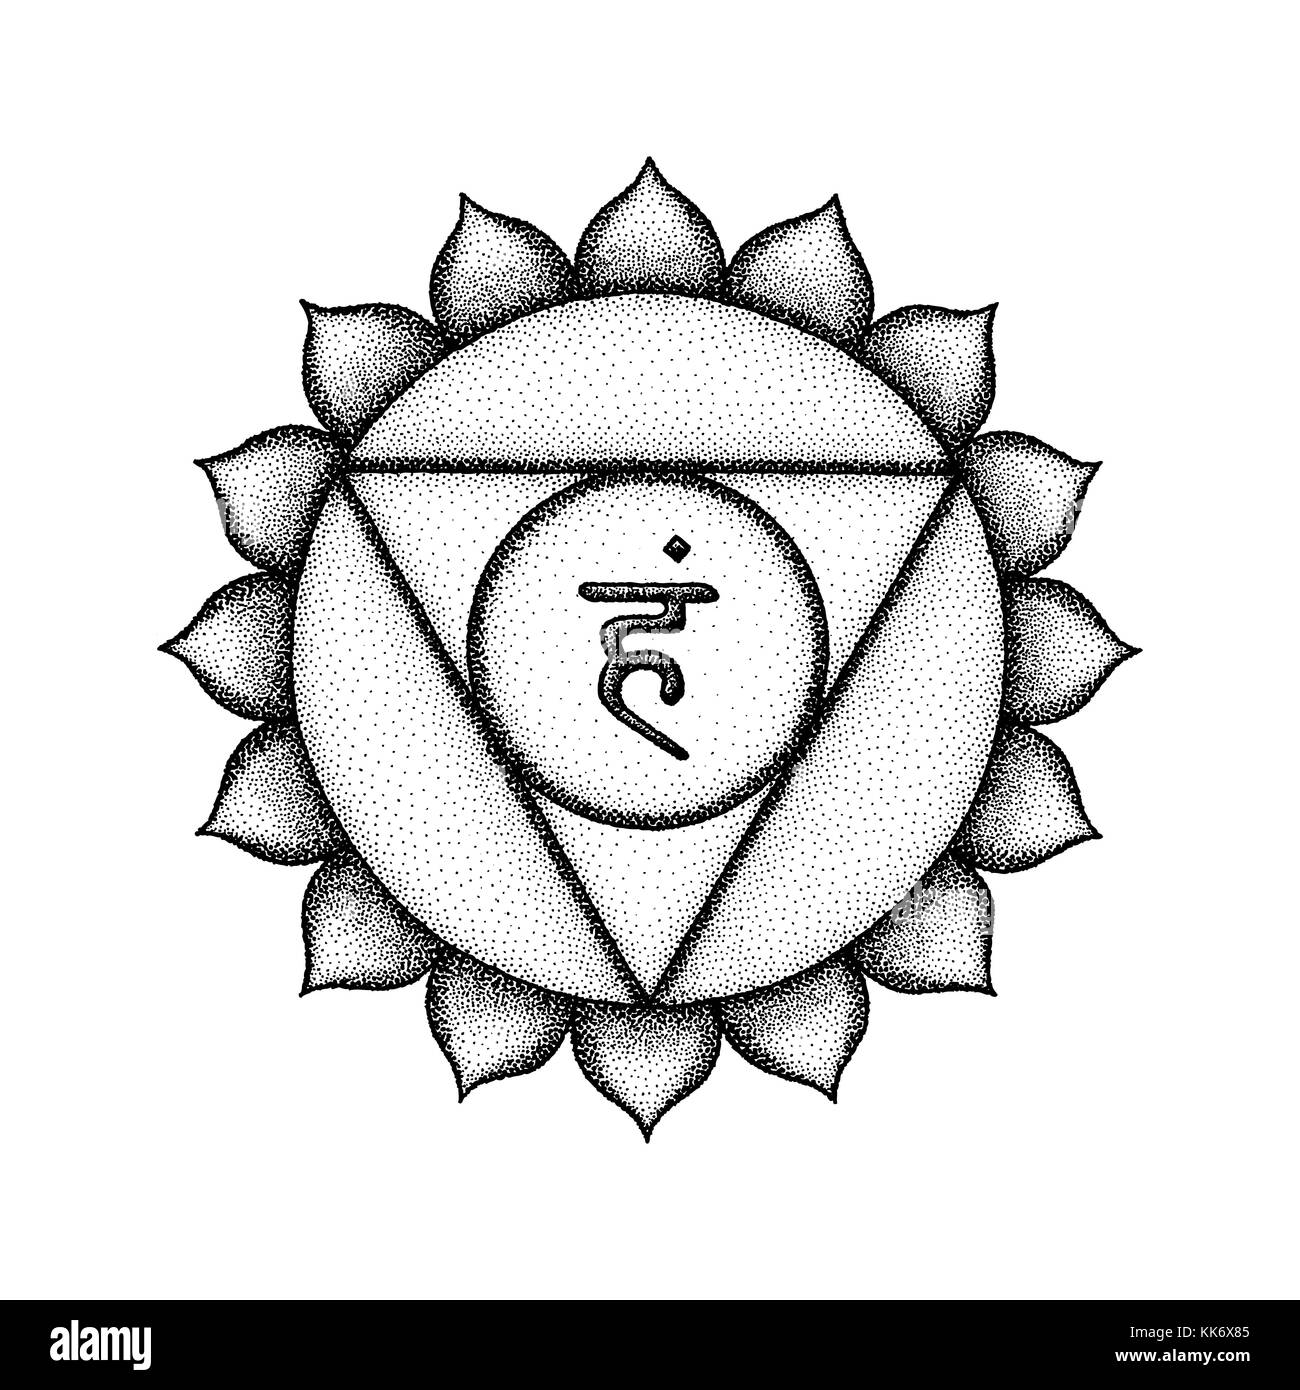 Chakra symbols tattoo choice image symbol and sign ideas vector fifth vishuddha throat chakra sanskrit seed mantra ham stock vector fifth vishuddha throat chakra sanskrit buycottarizona Image collections